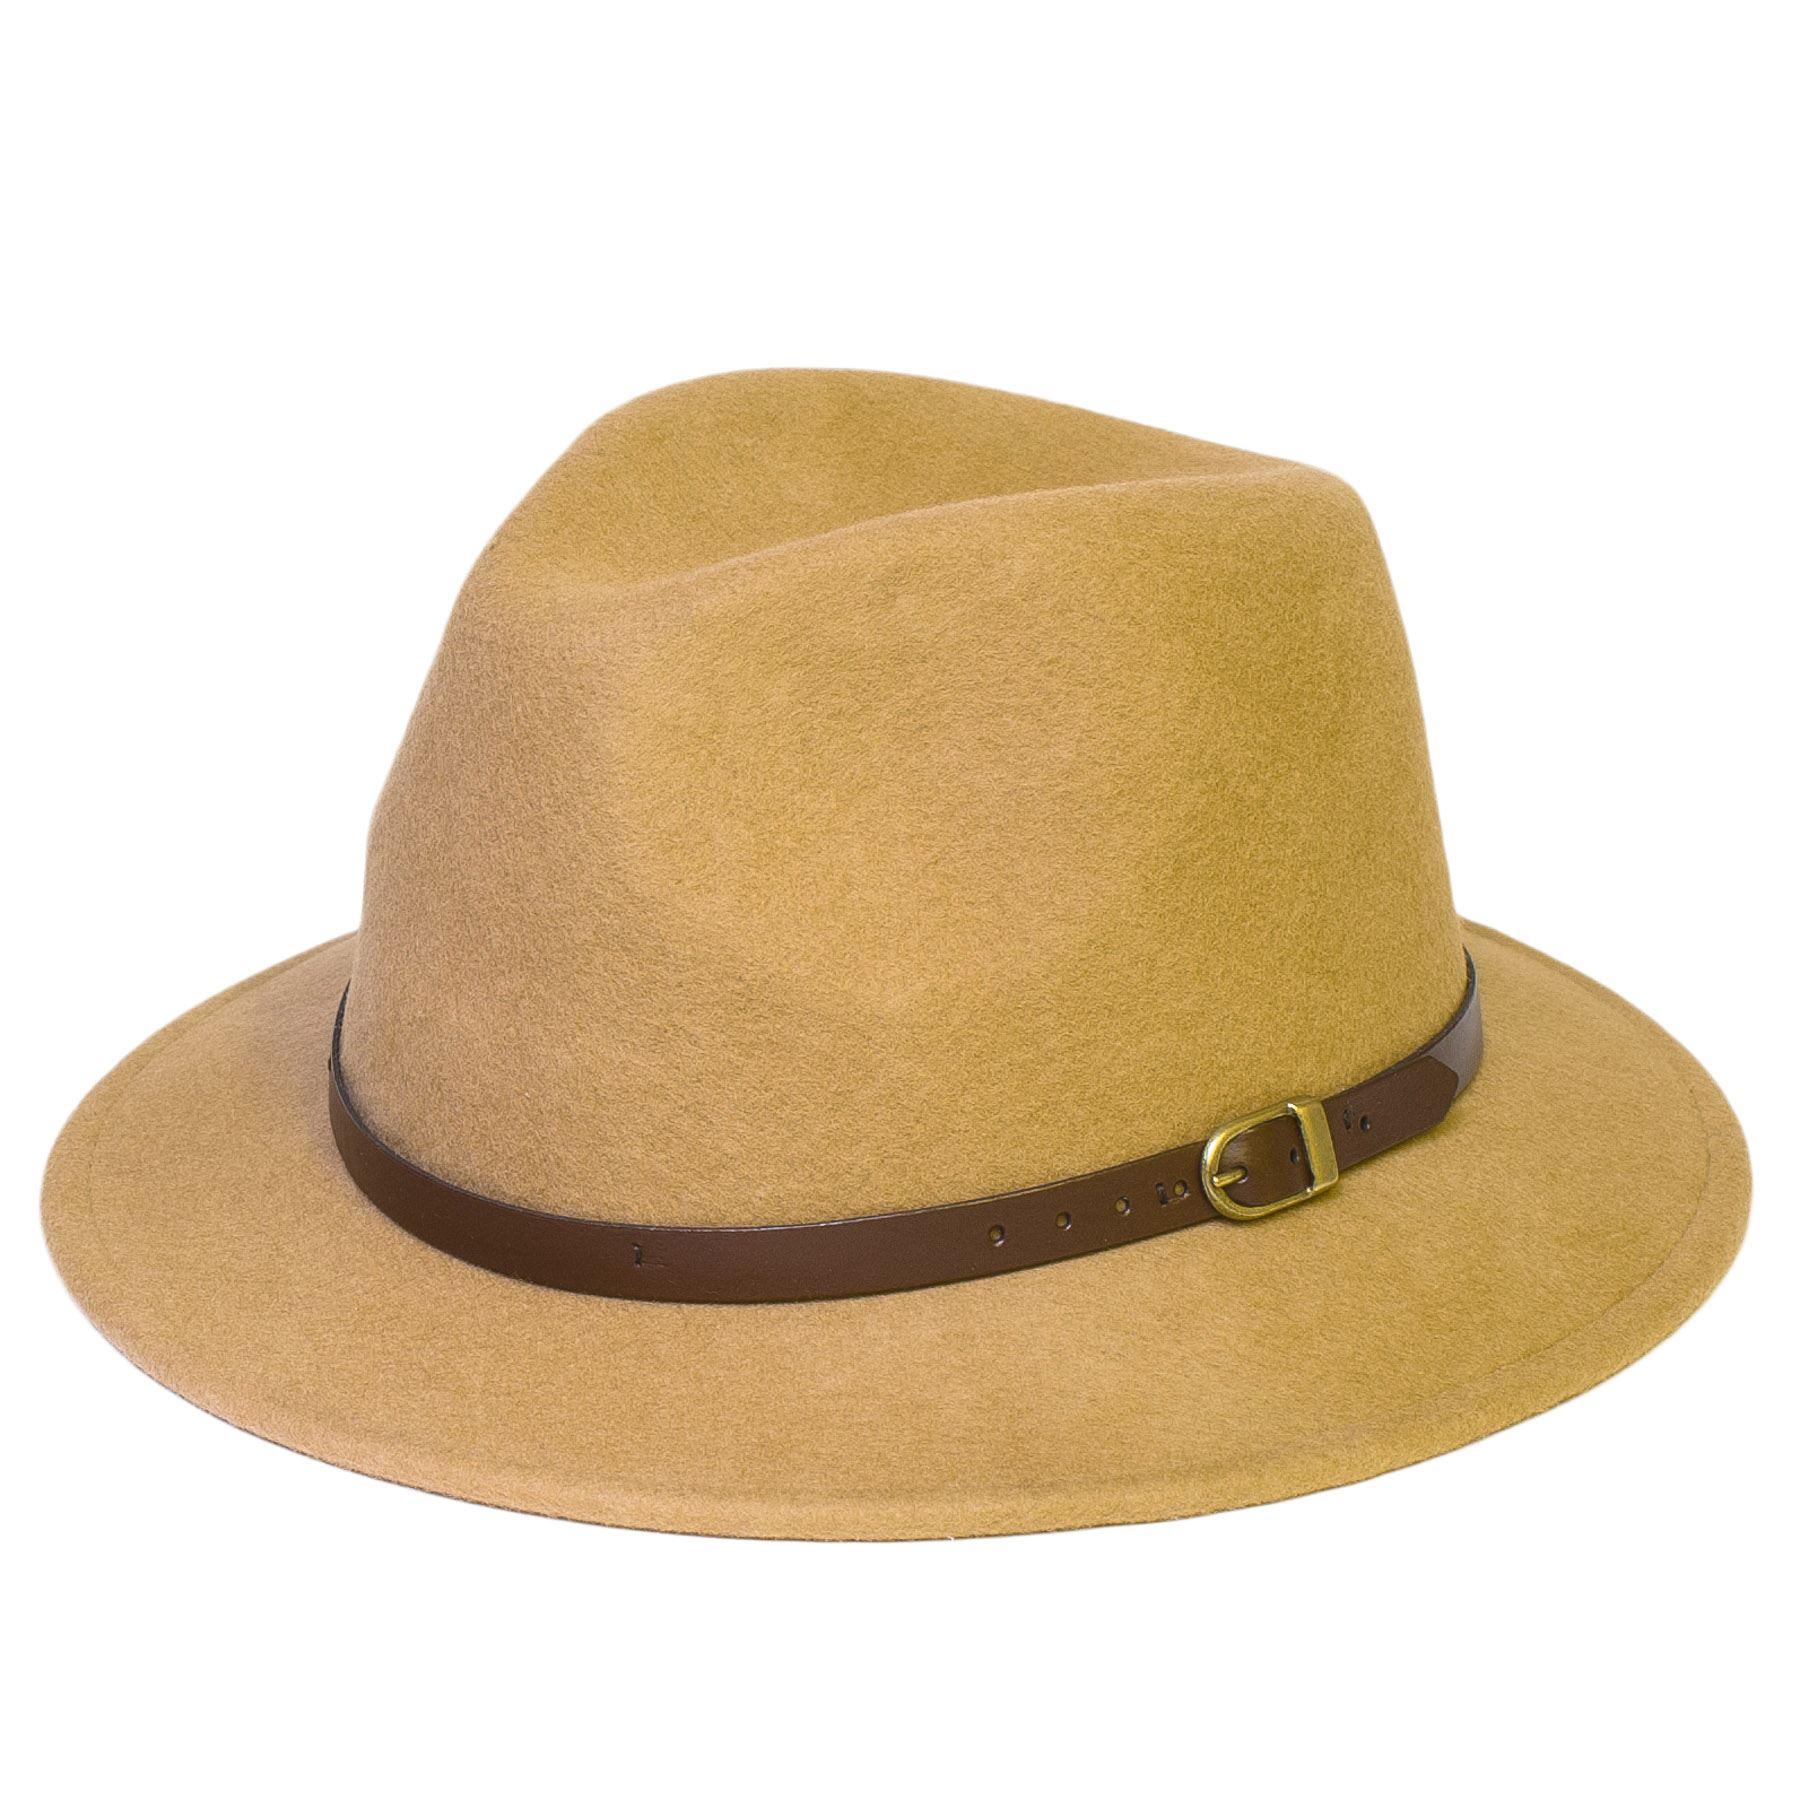 Mens Women Wool Hand Made Felt Fedora Wide Brim Panama ...